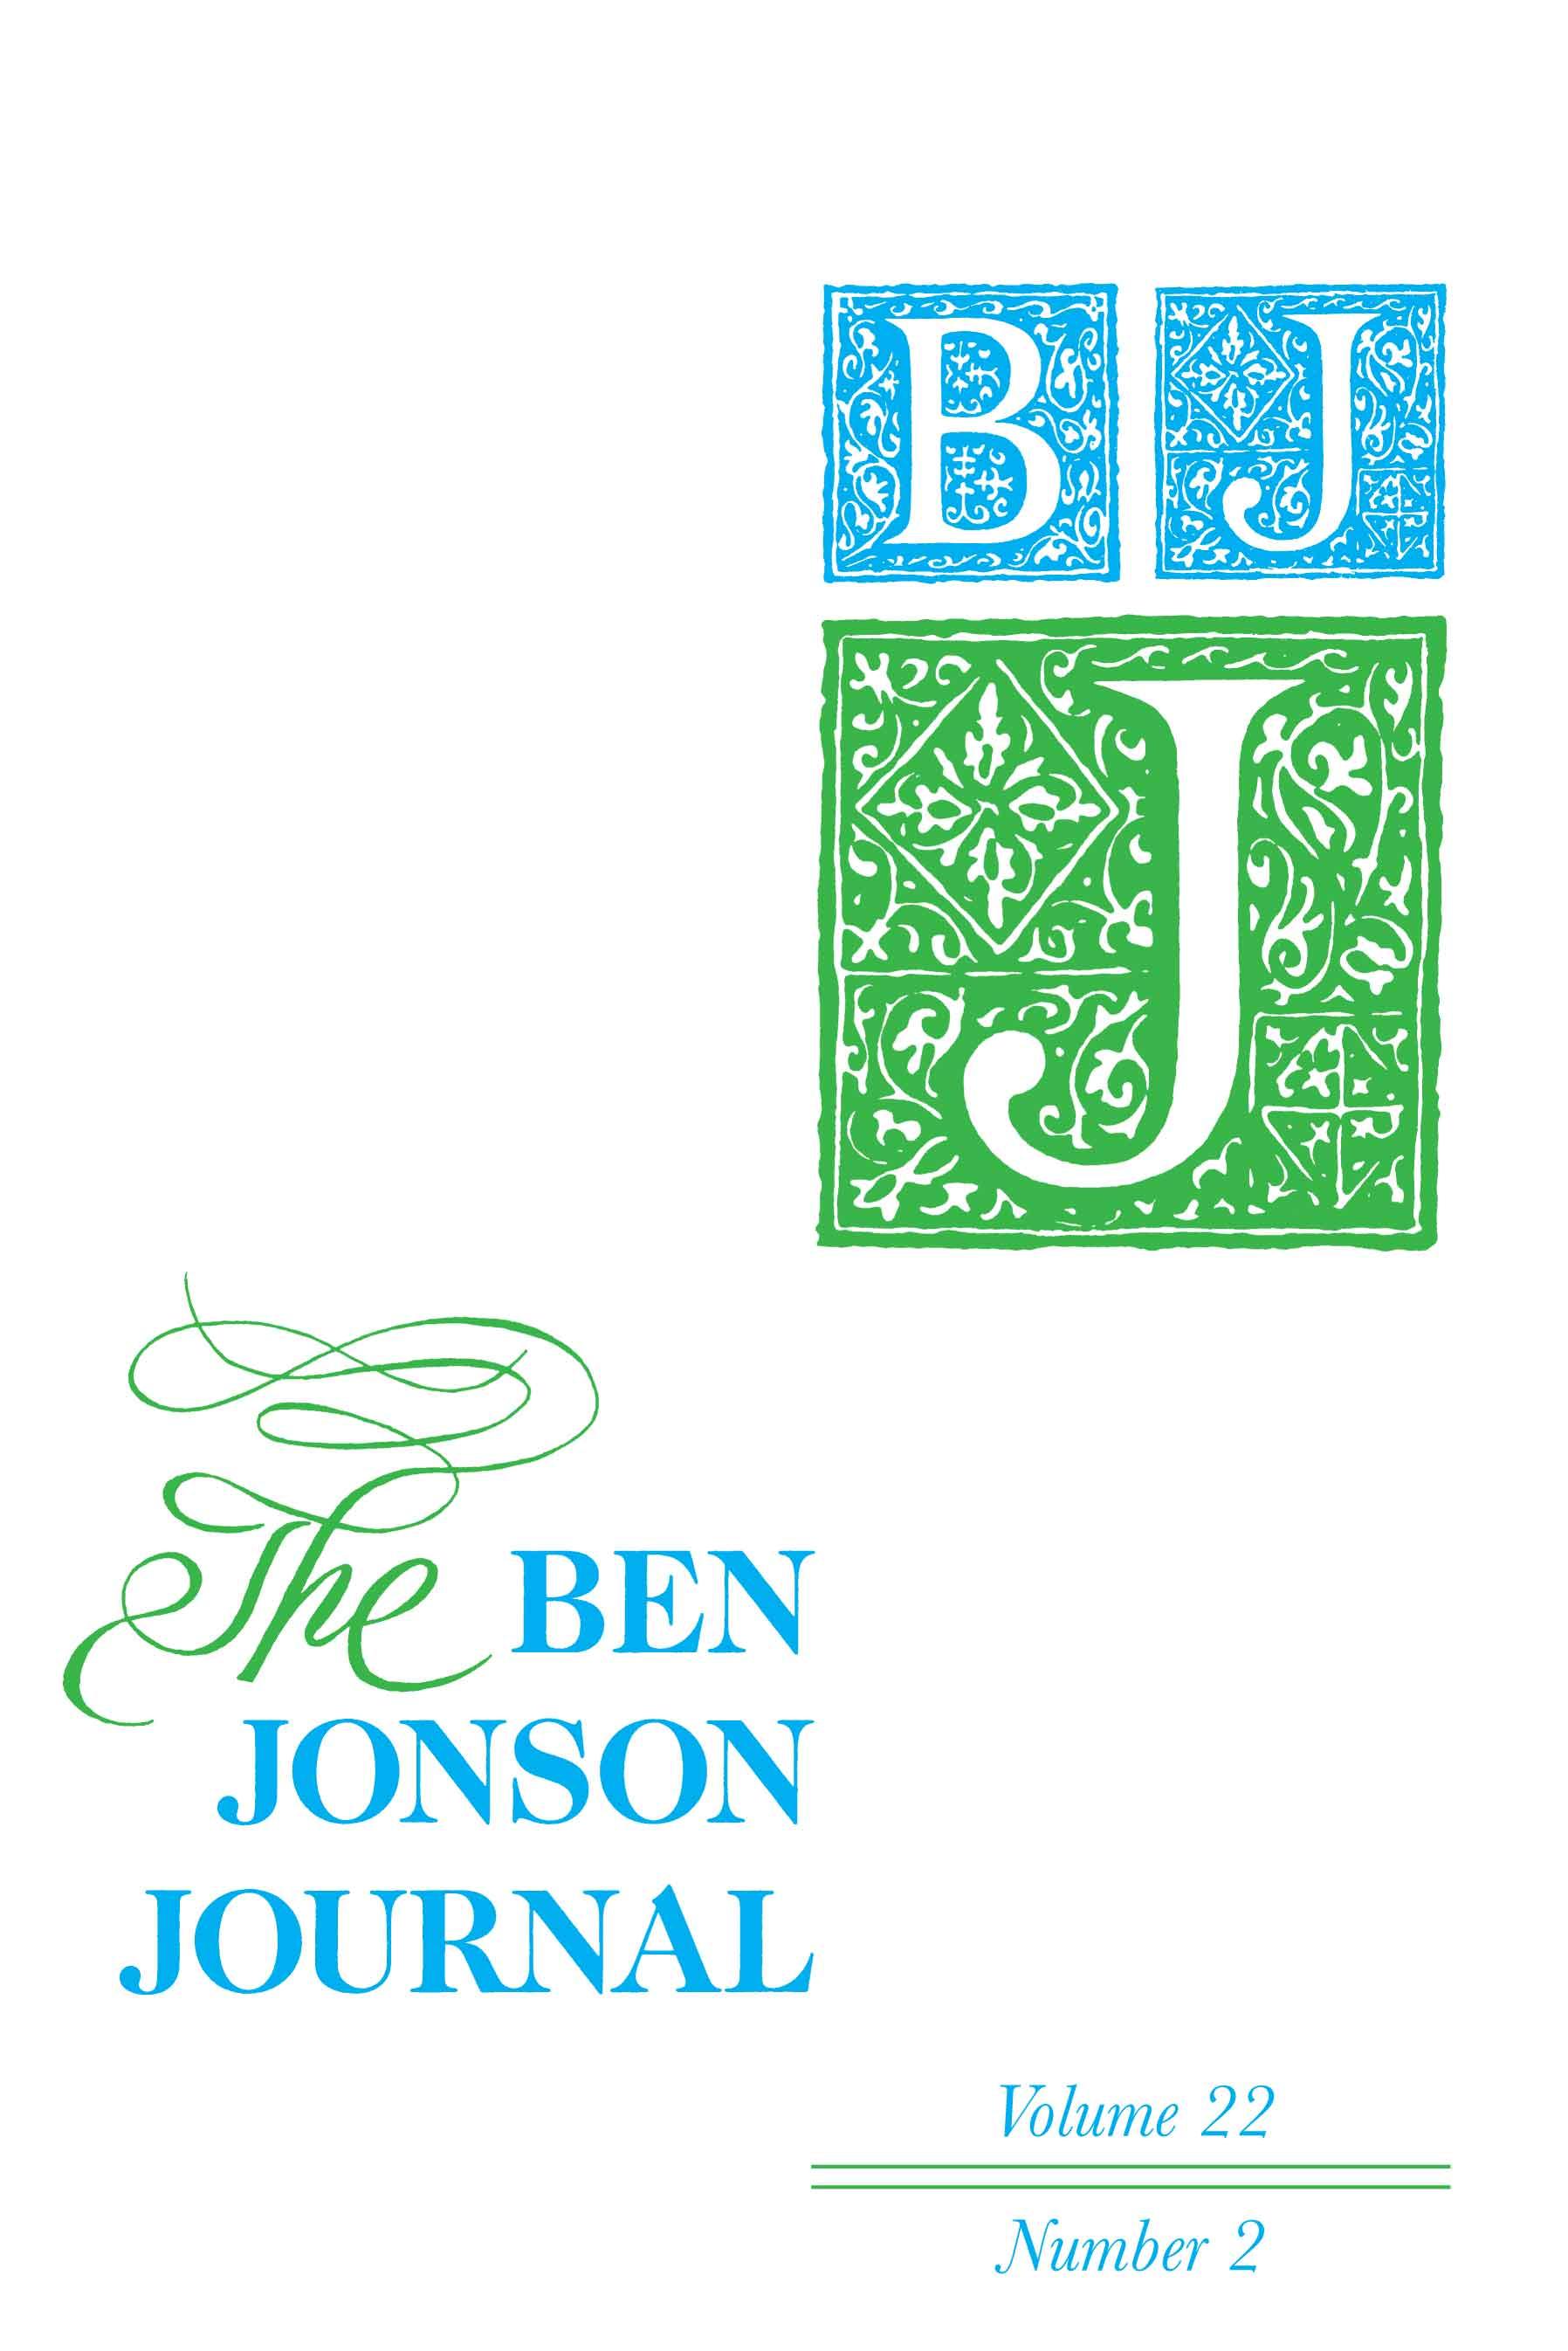 Ben Jonson Journal